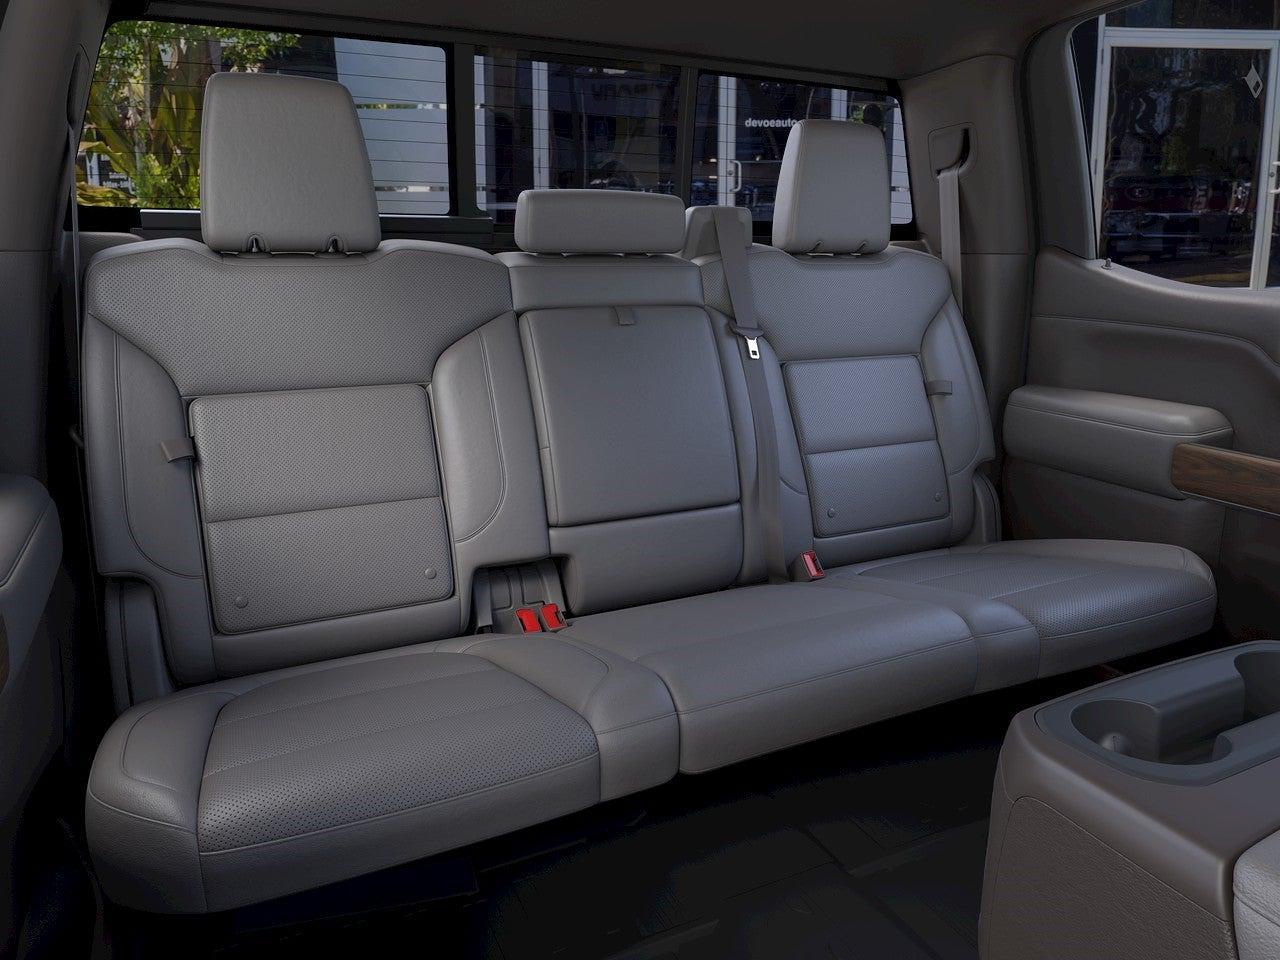 2021 GMC Sierra 1500 Crew Cab 4x4, Pickup #T21420 - photo 34